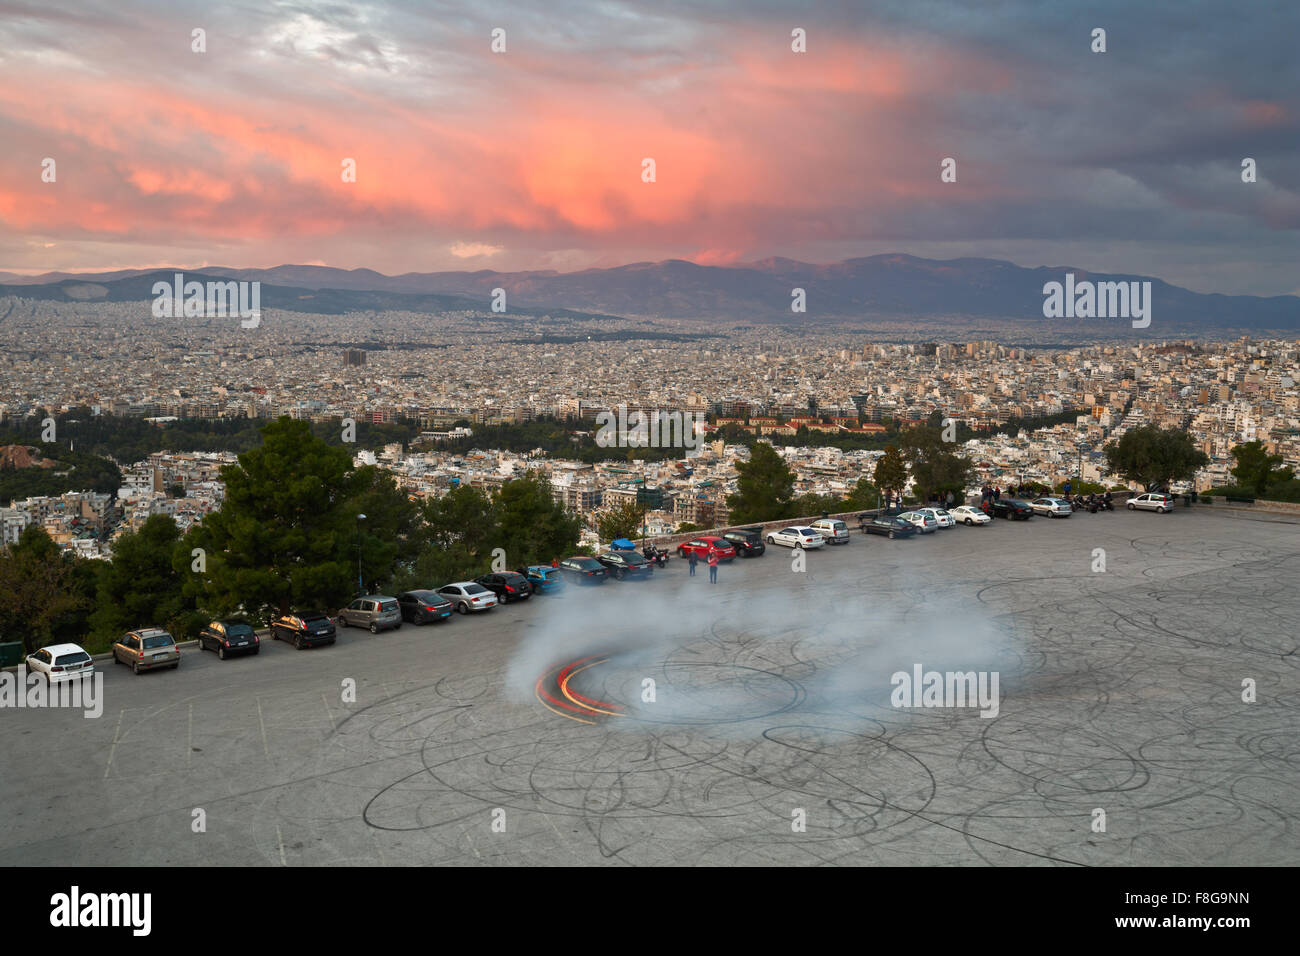 Parkplatz am Lycabettus-Hügel in Athen, Griechenland. Stockbild